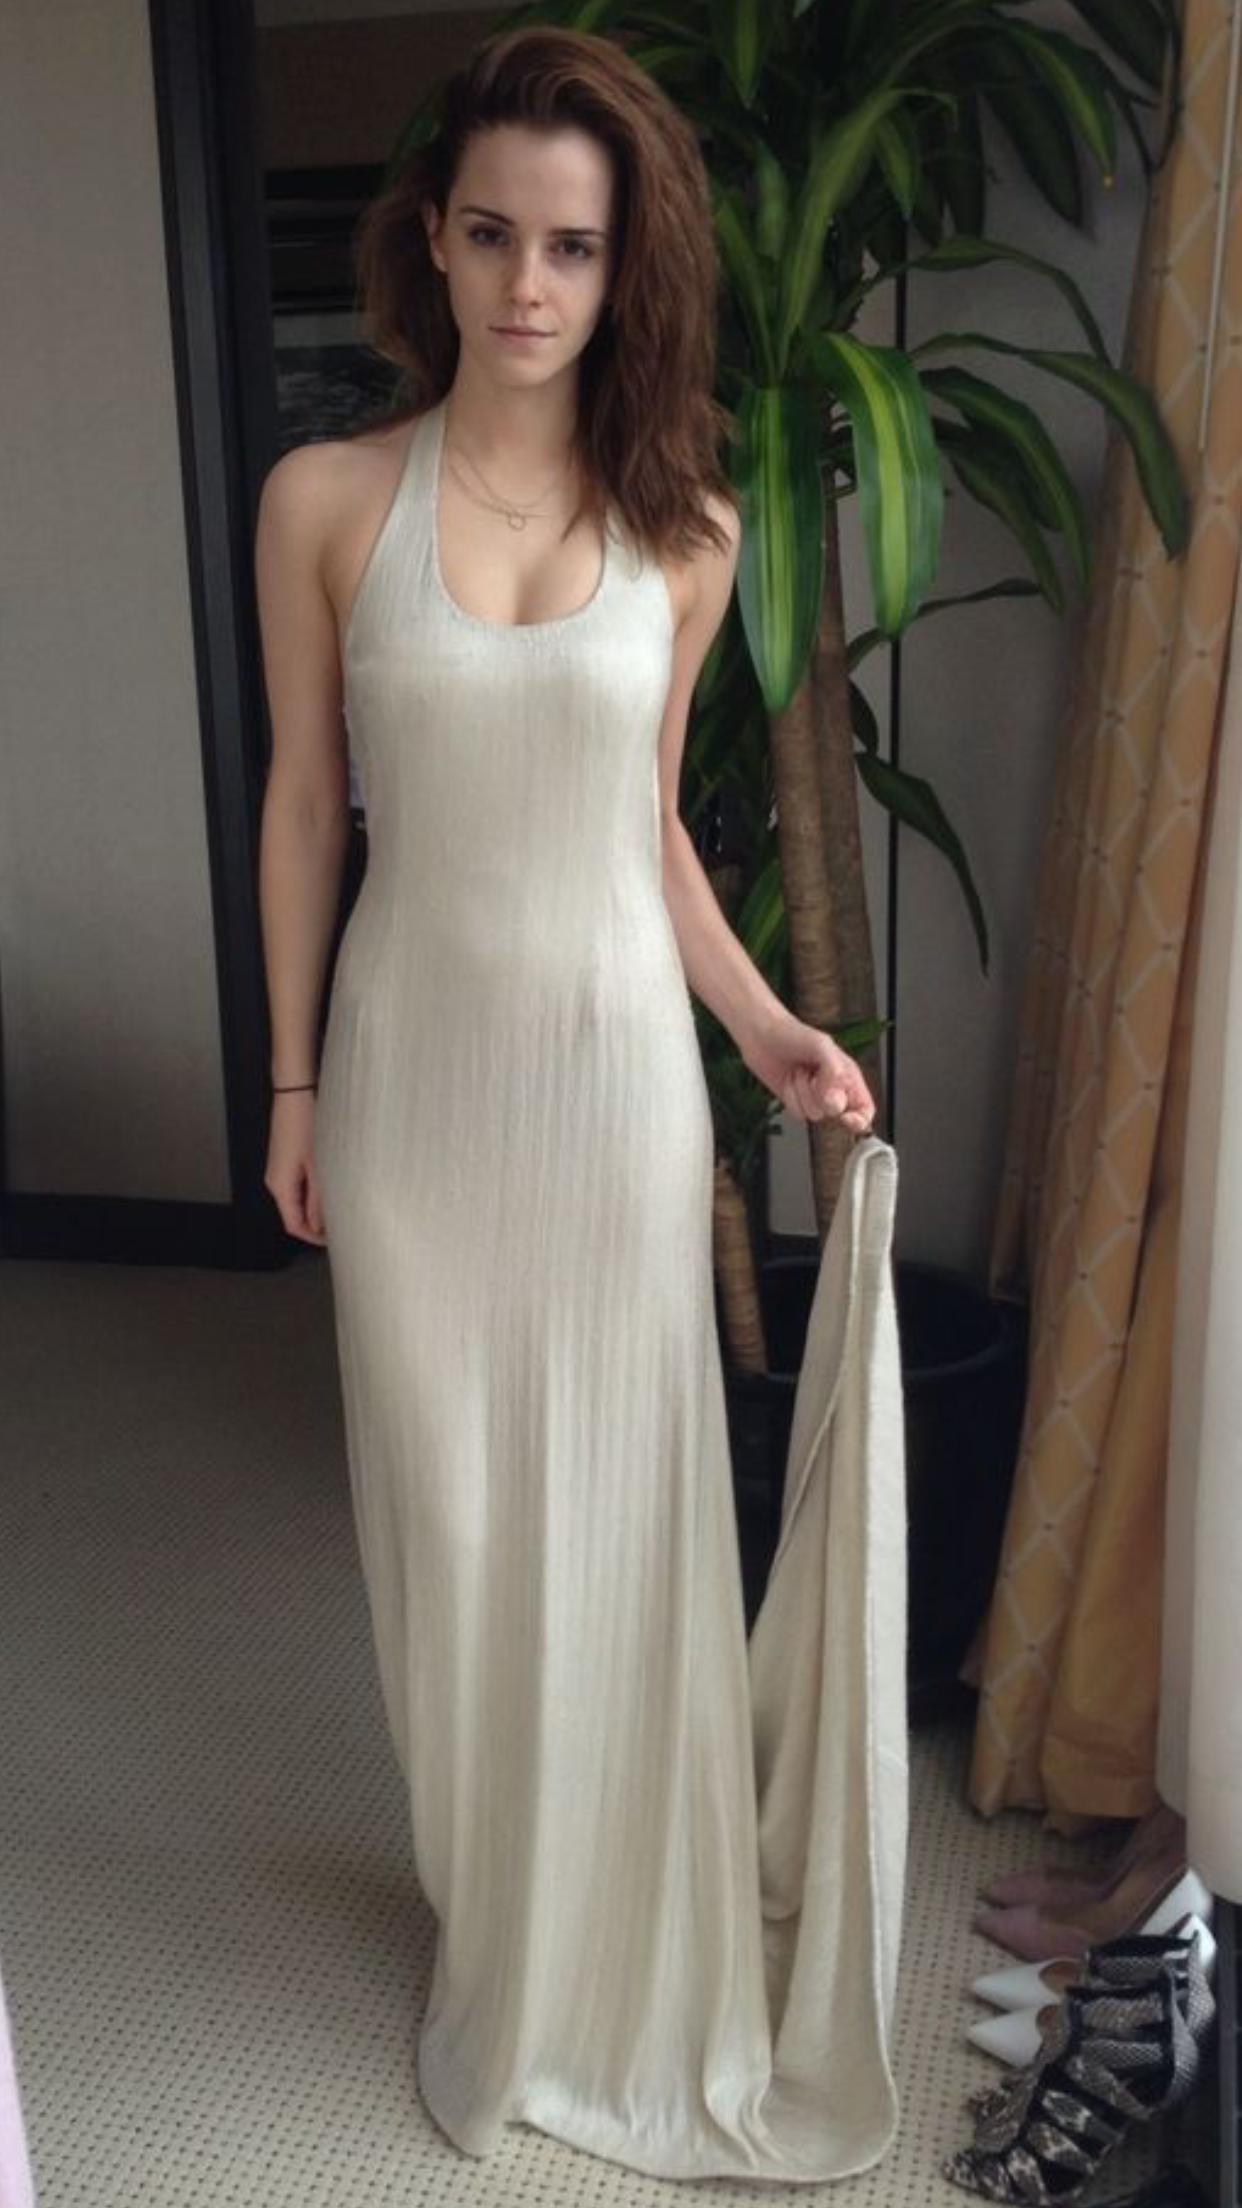 Wonderful dress and beautiful girl Impressive  Actors